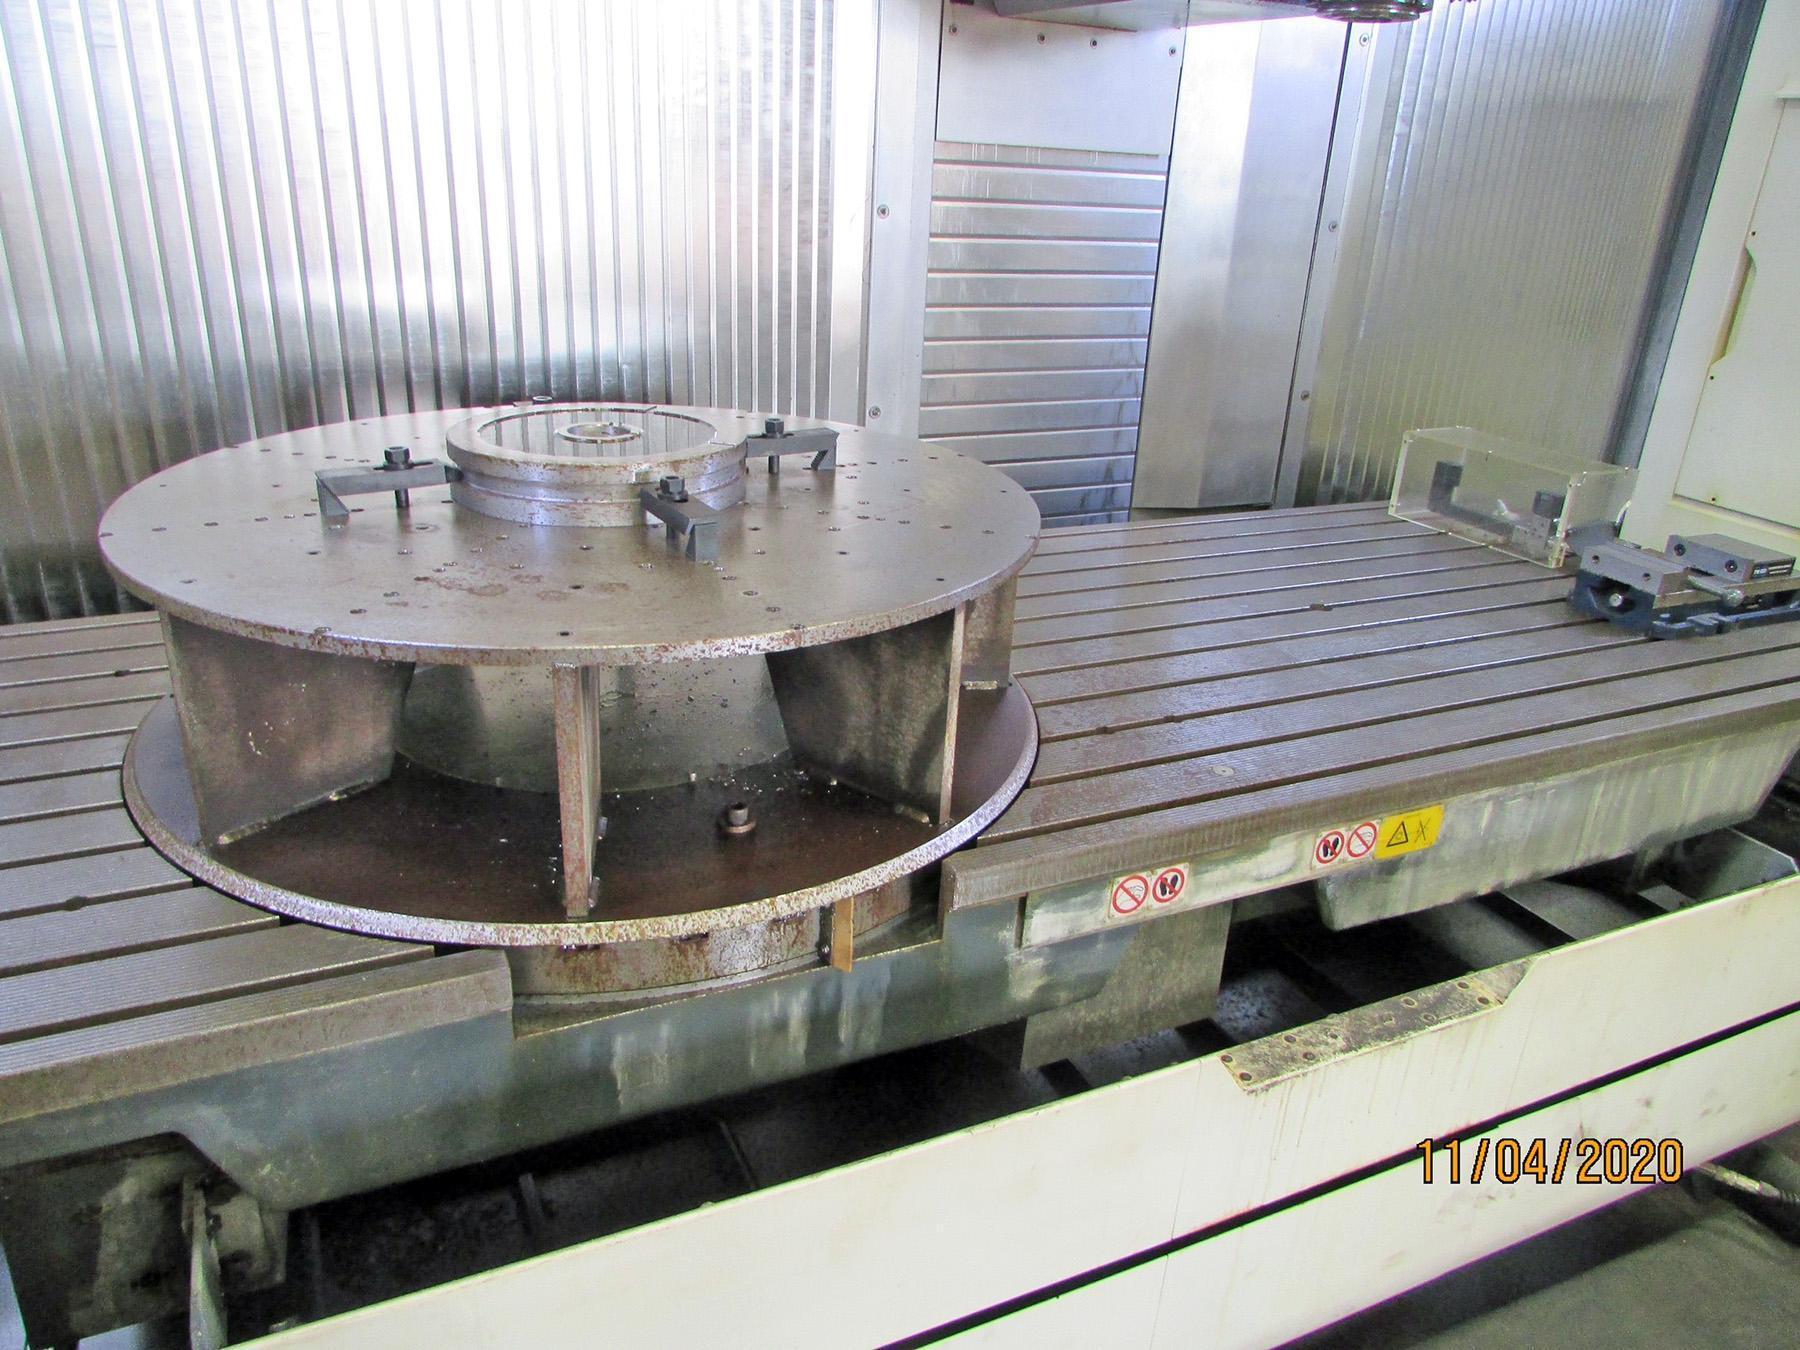 USED, DMG MORI DMF 260/11 LINEAR 5 AXIS CNC VERTICAL MACHINING CENTER